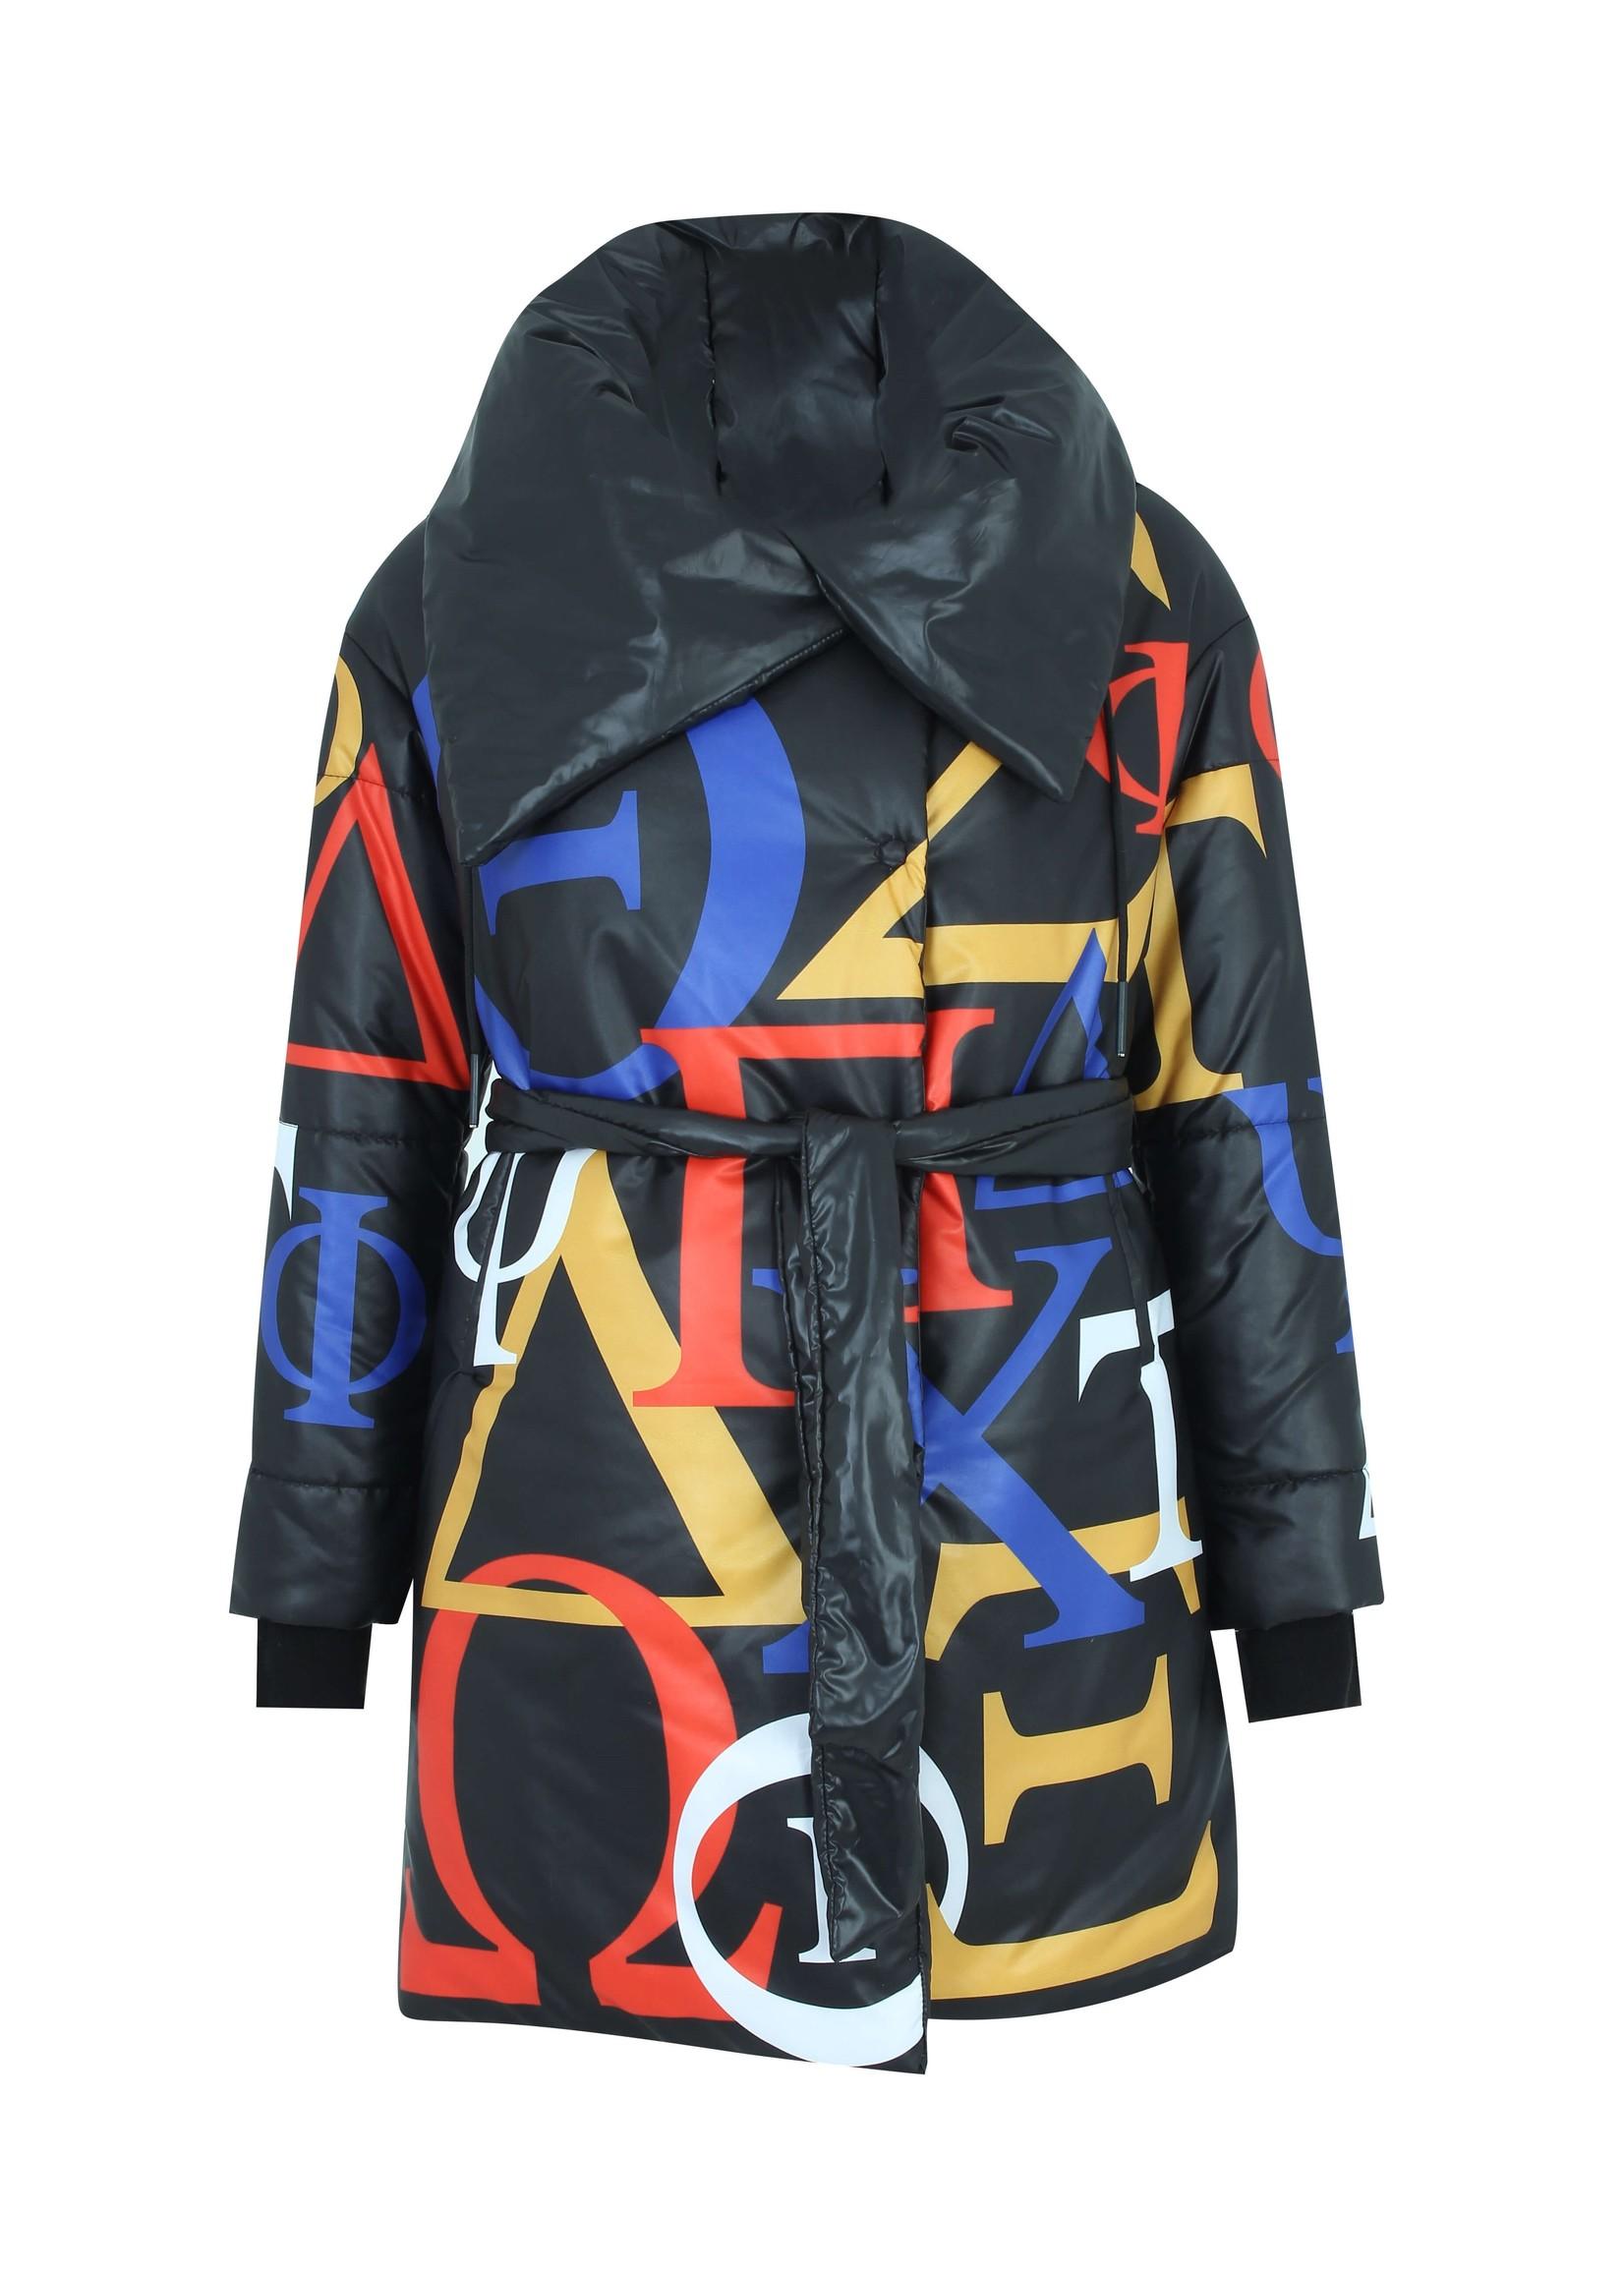 STEPPINOUT 21105  printed winter coat